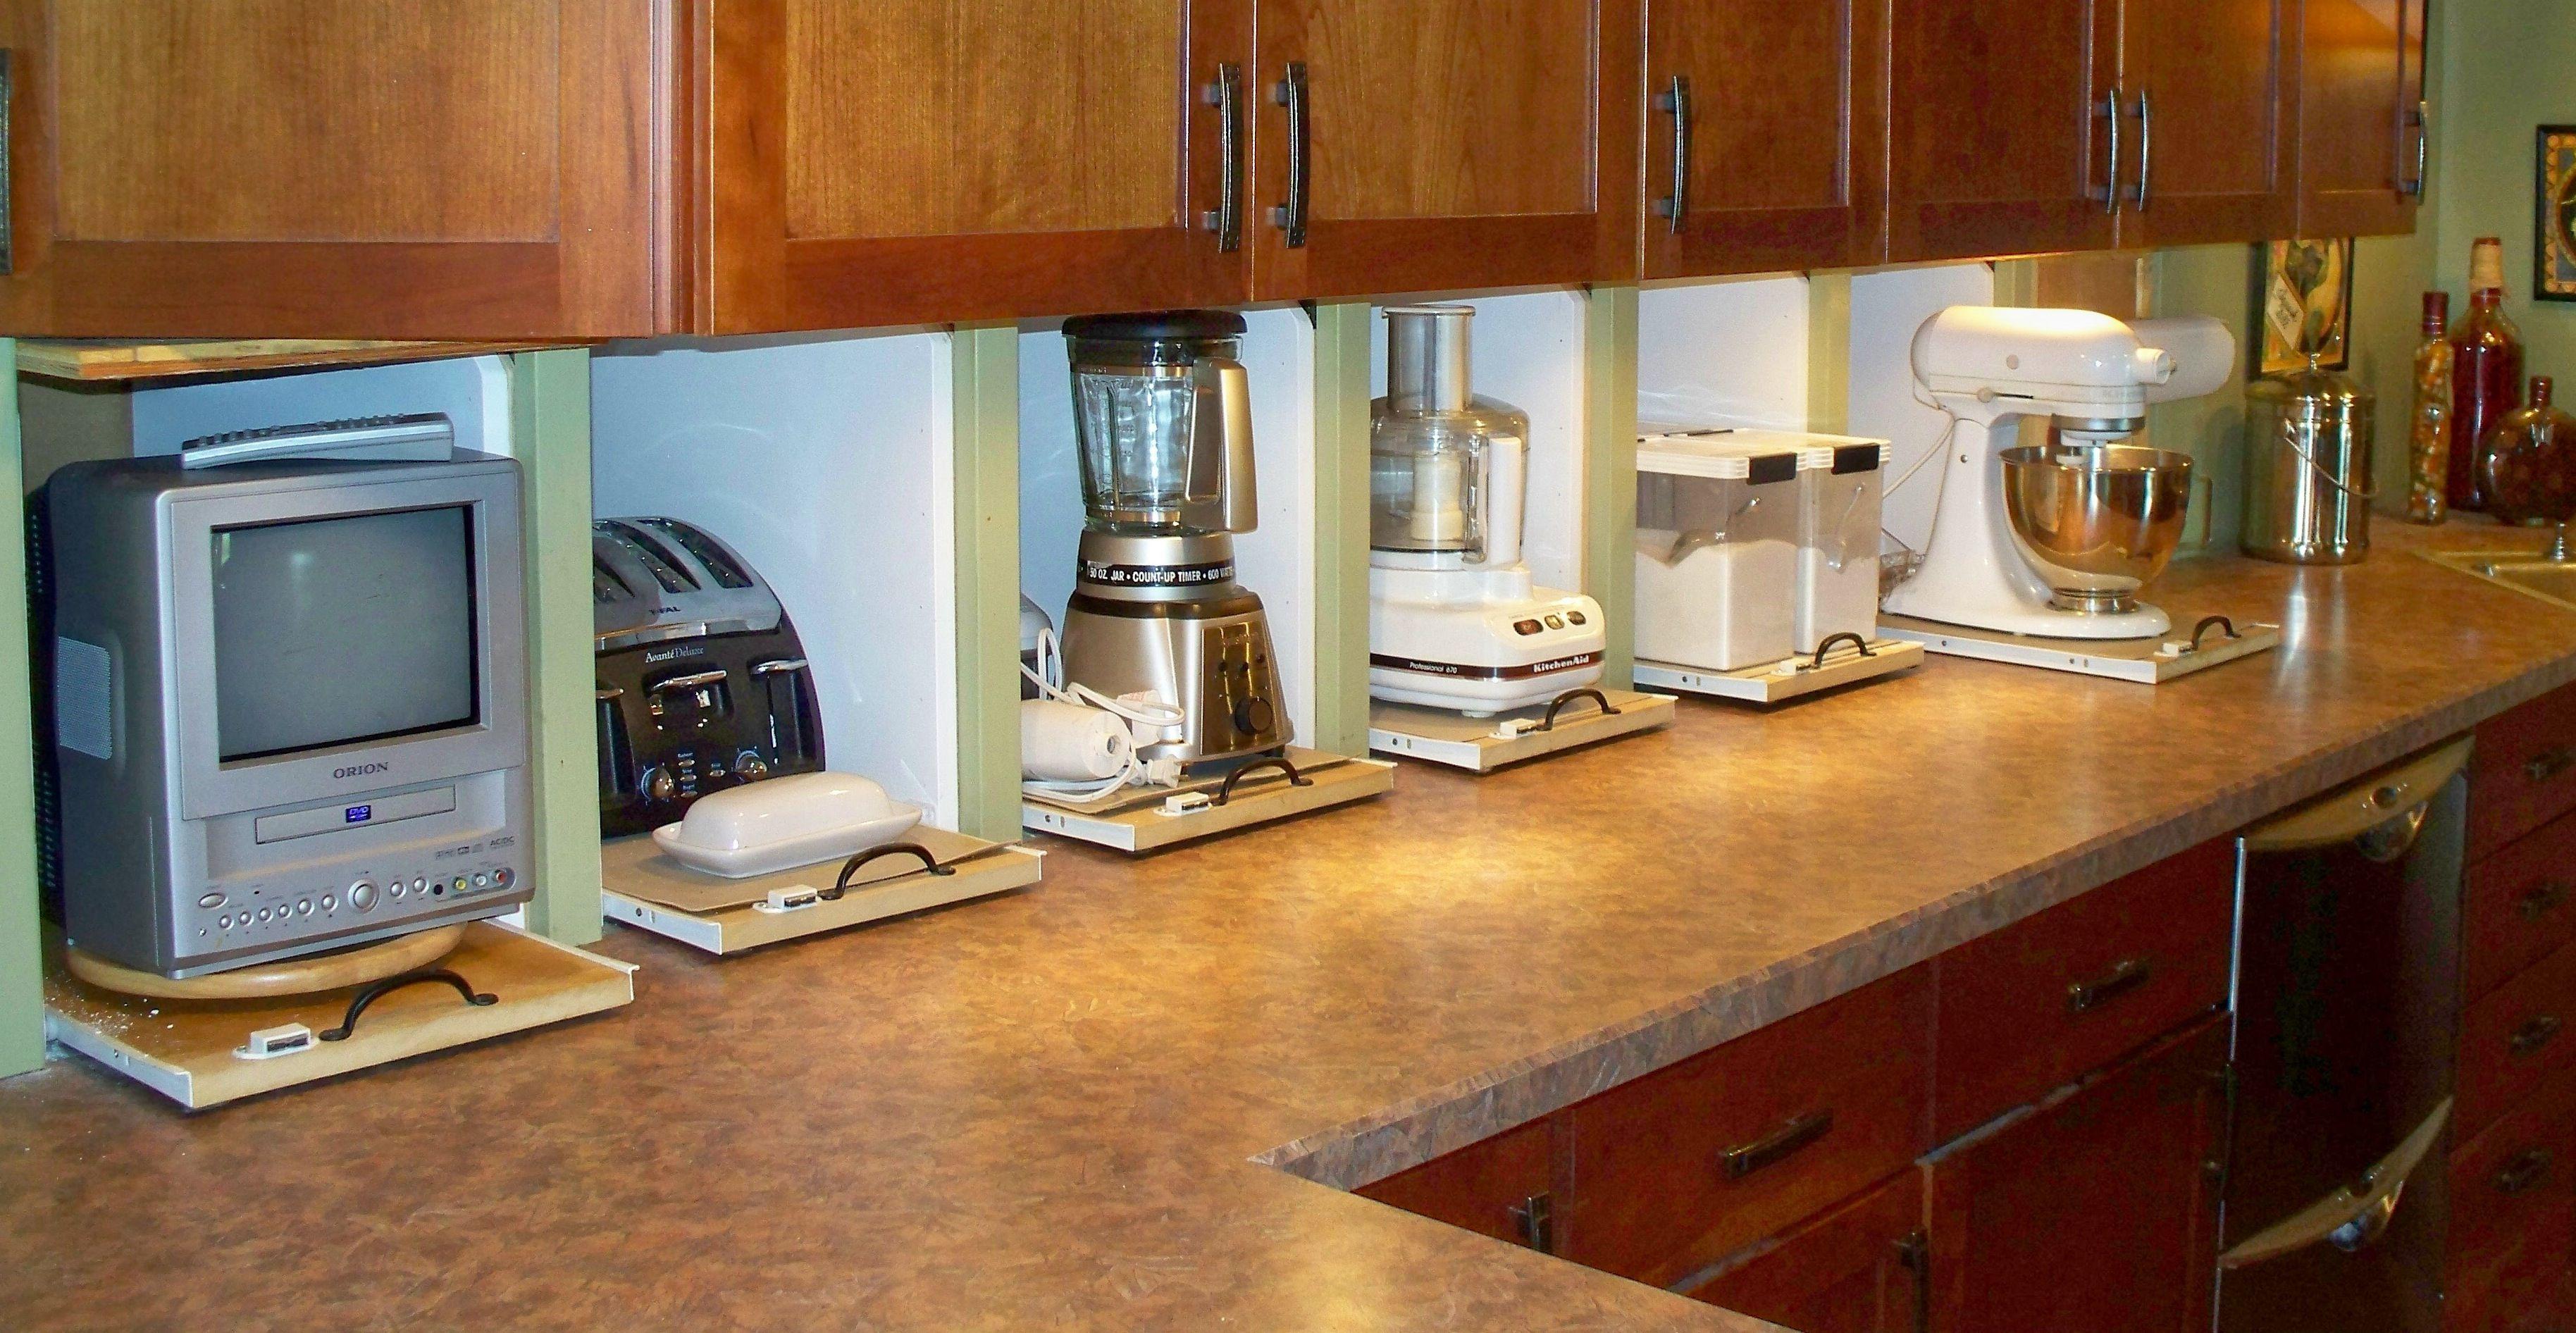 Tour The House Kitchen Kitchen Appliance Storage Space